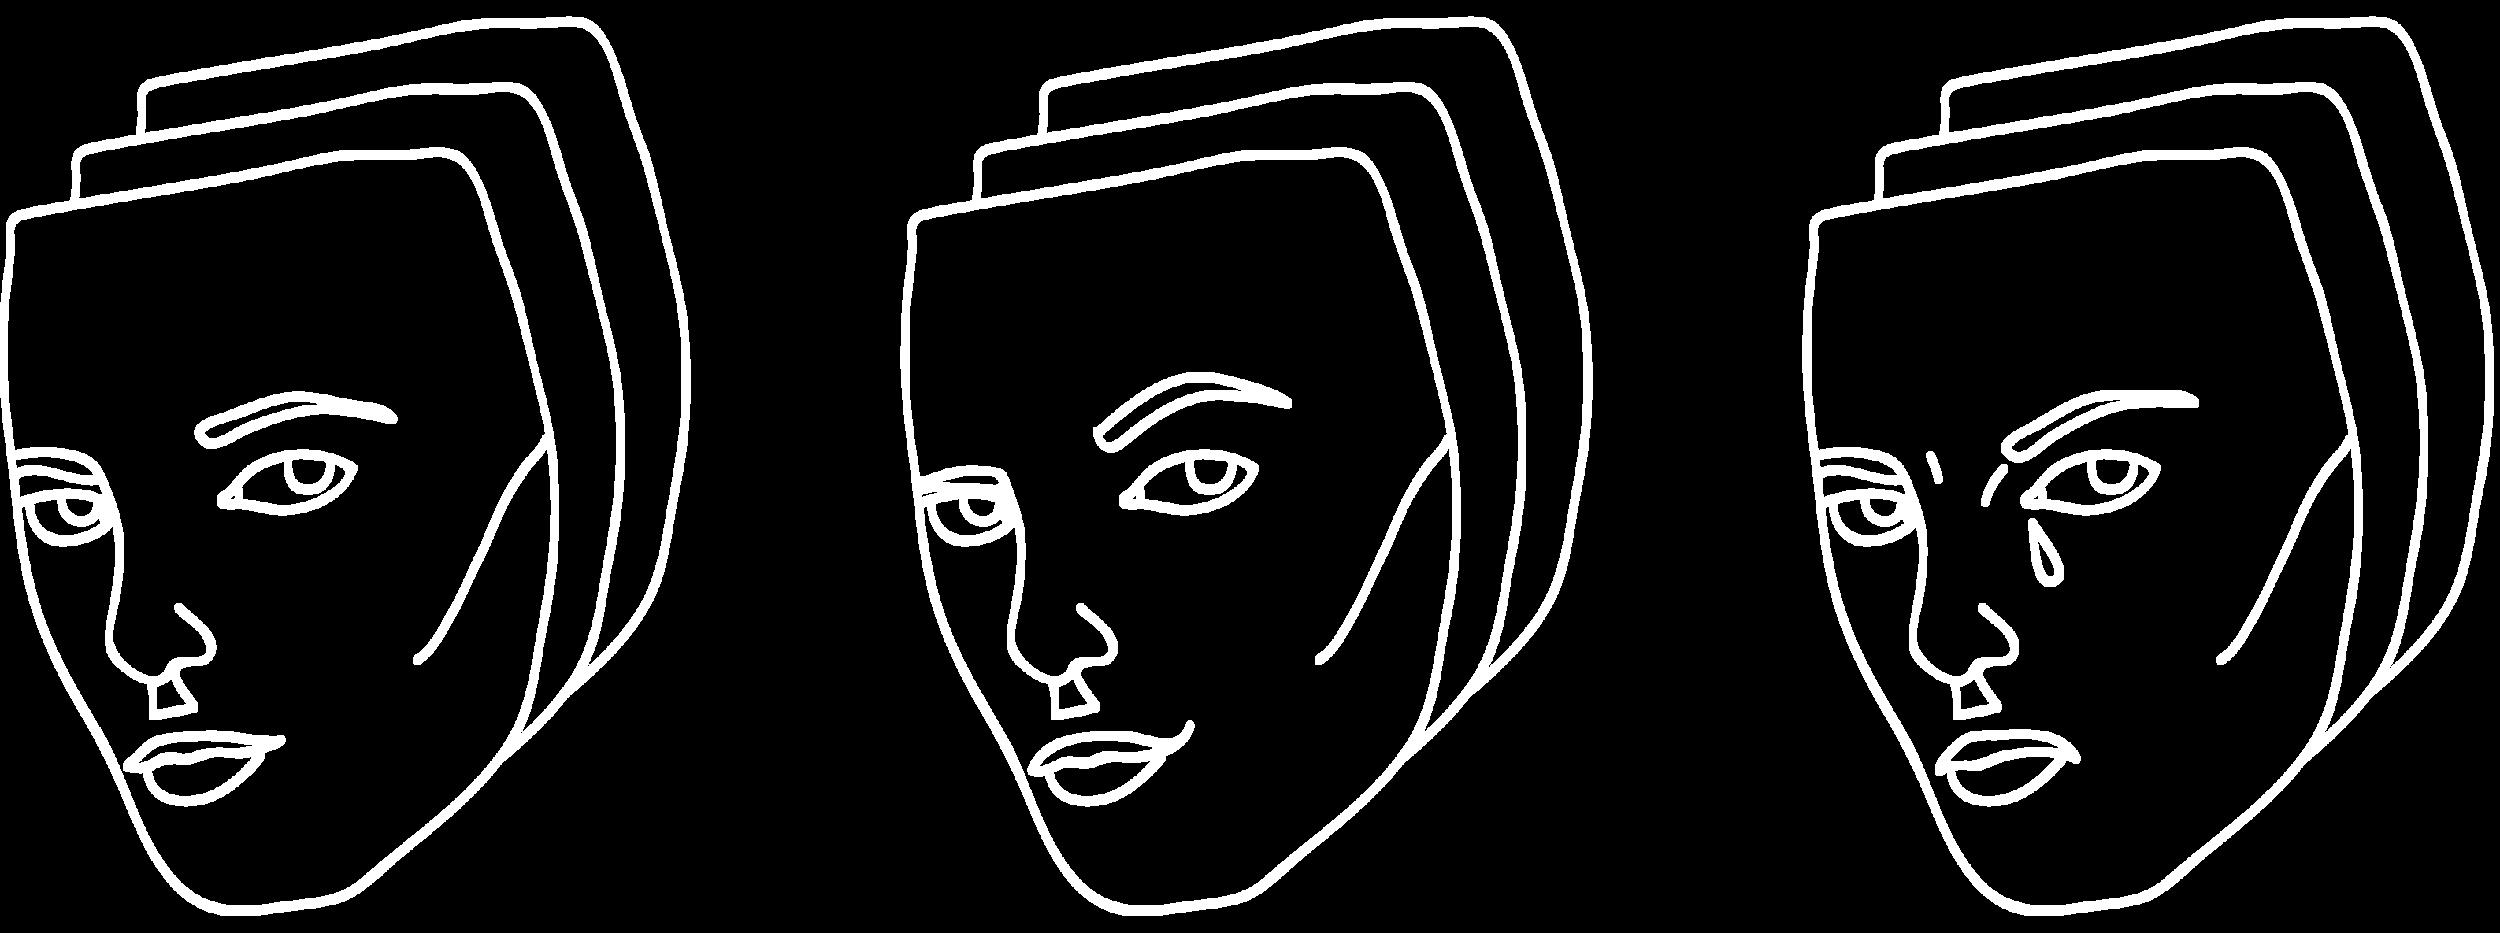 RGB_teaterriket_ansikten_ALLA_VIT.png